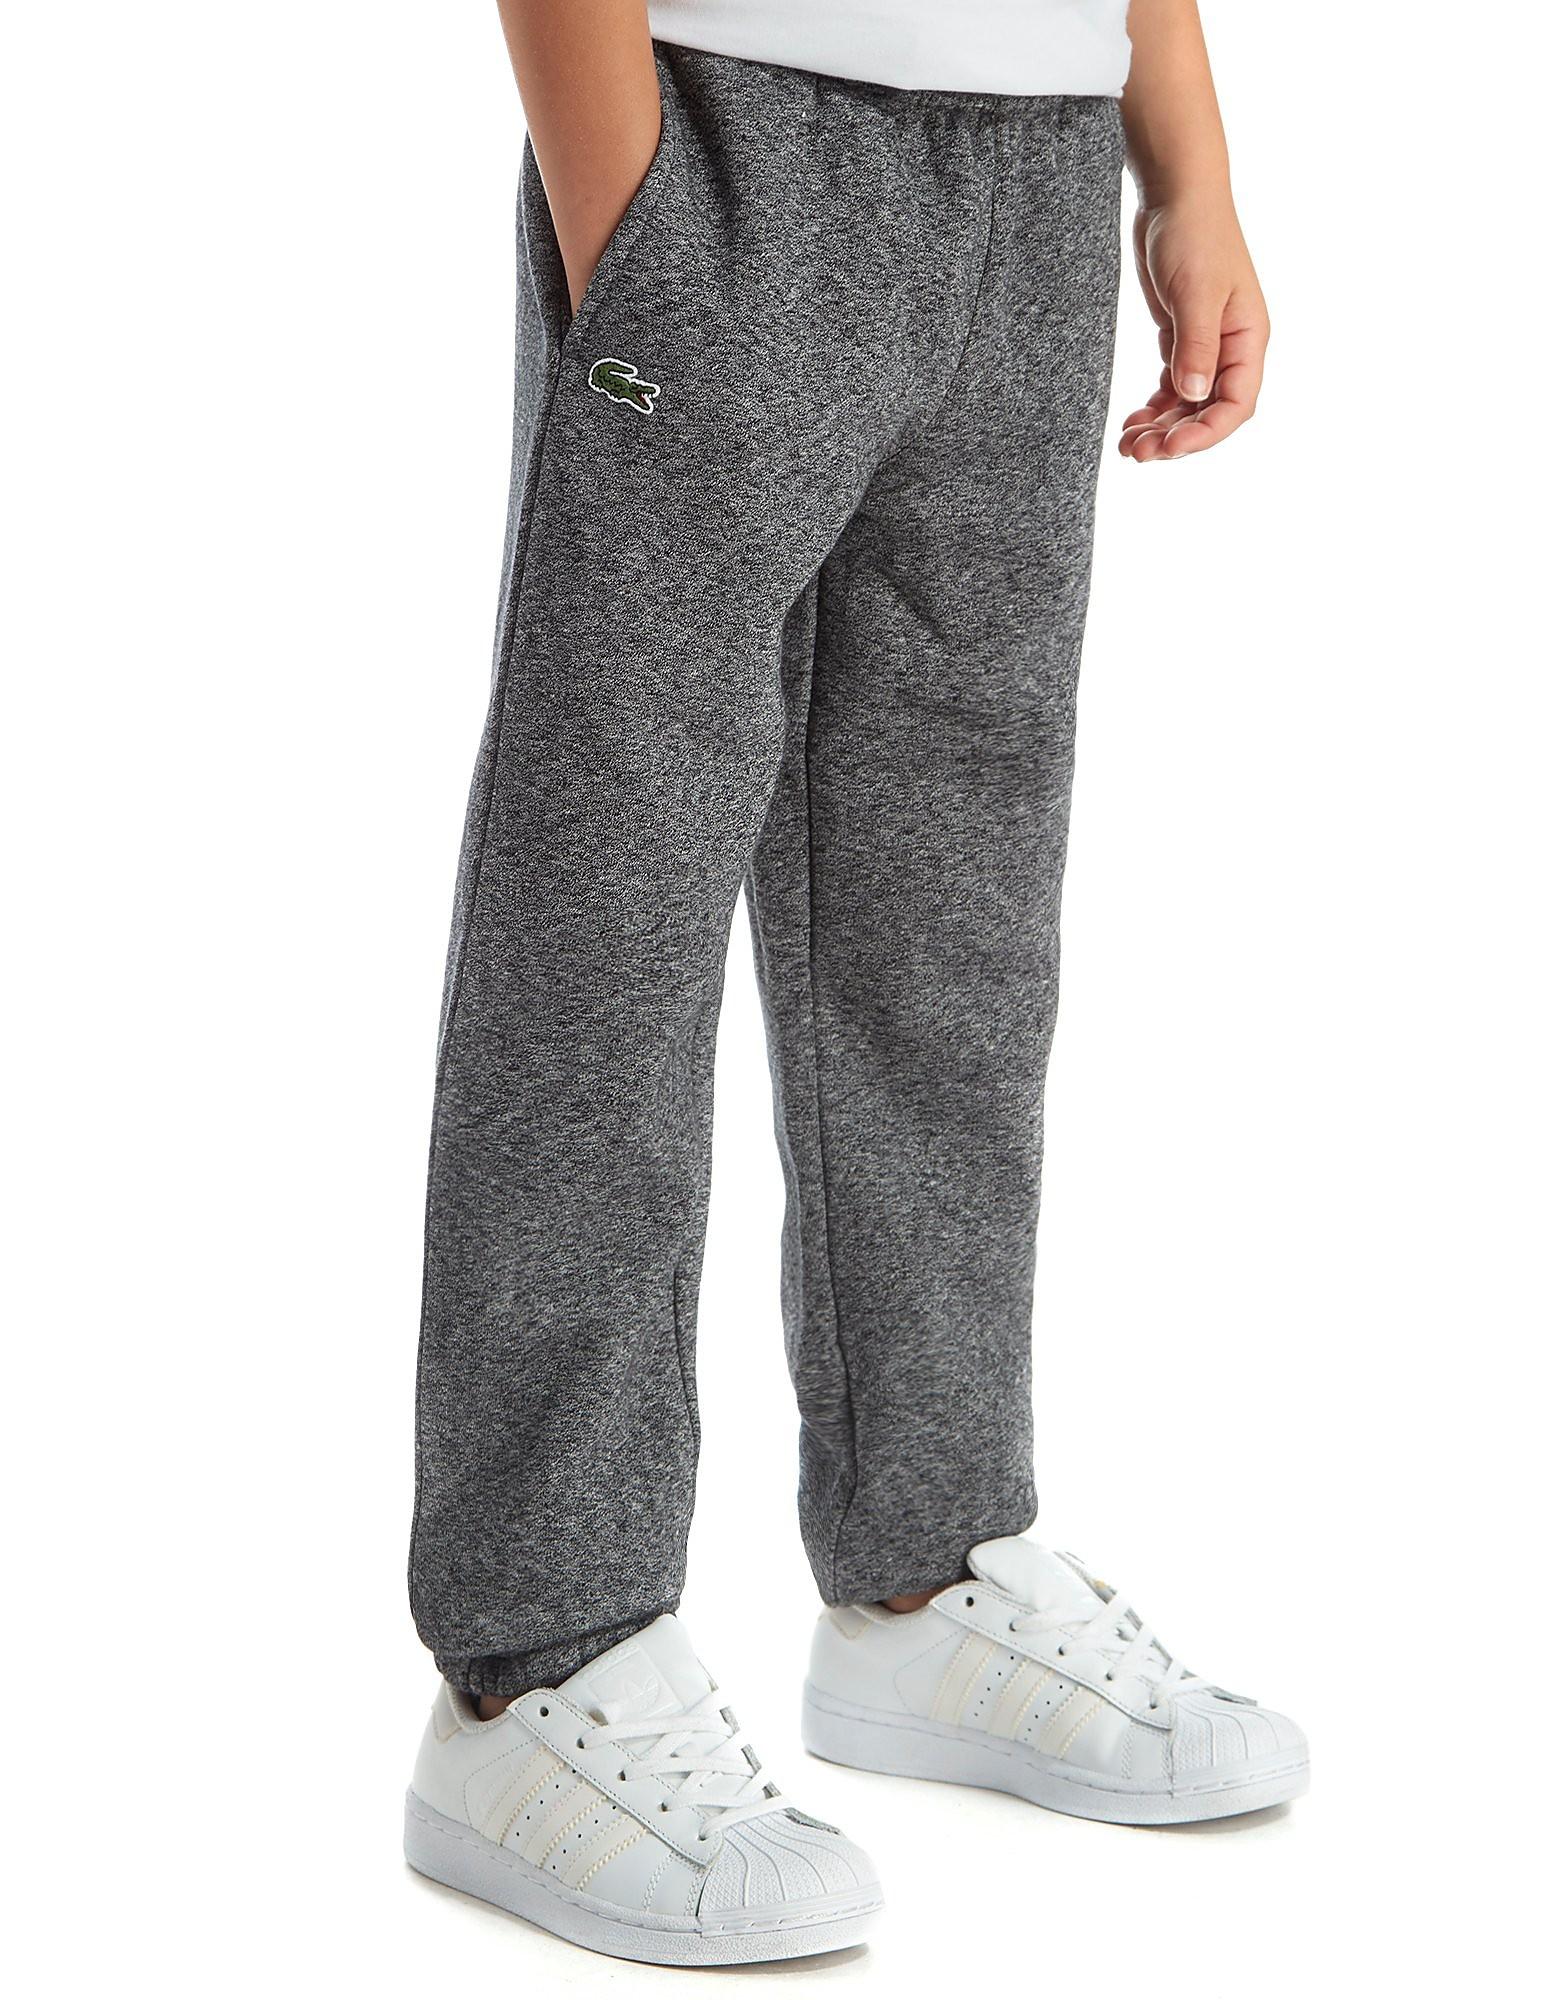 Lacoste Small Logo Pants Children